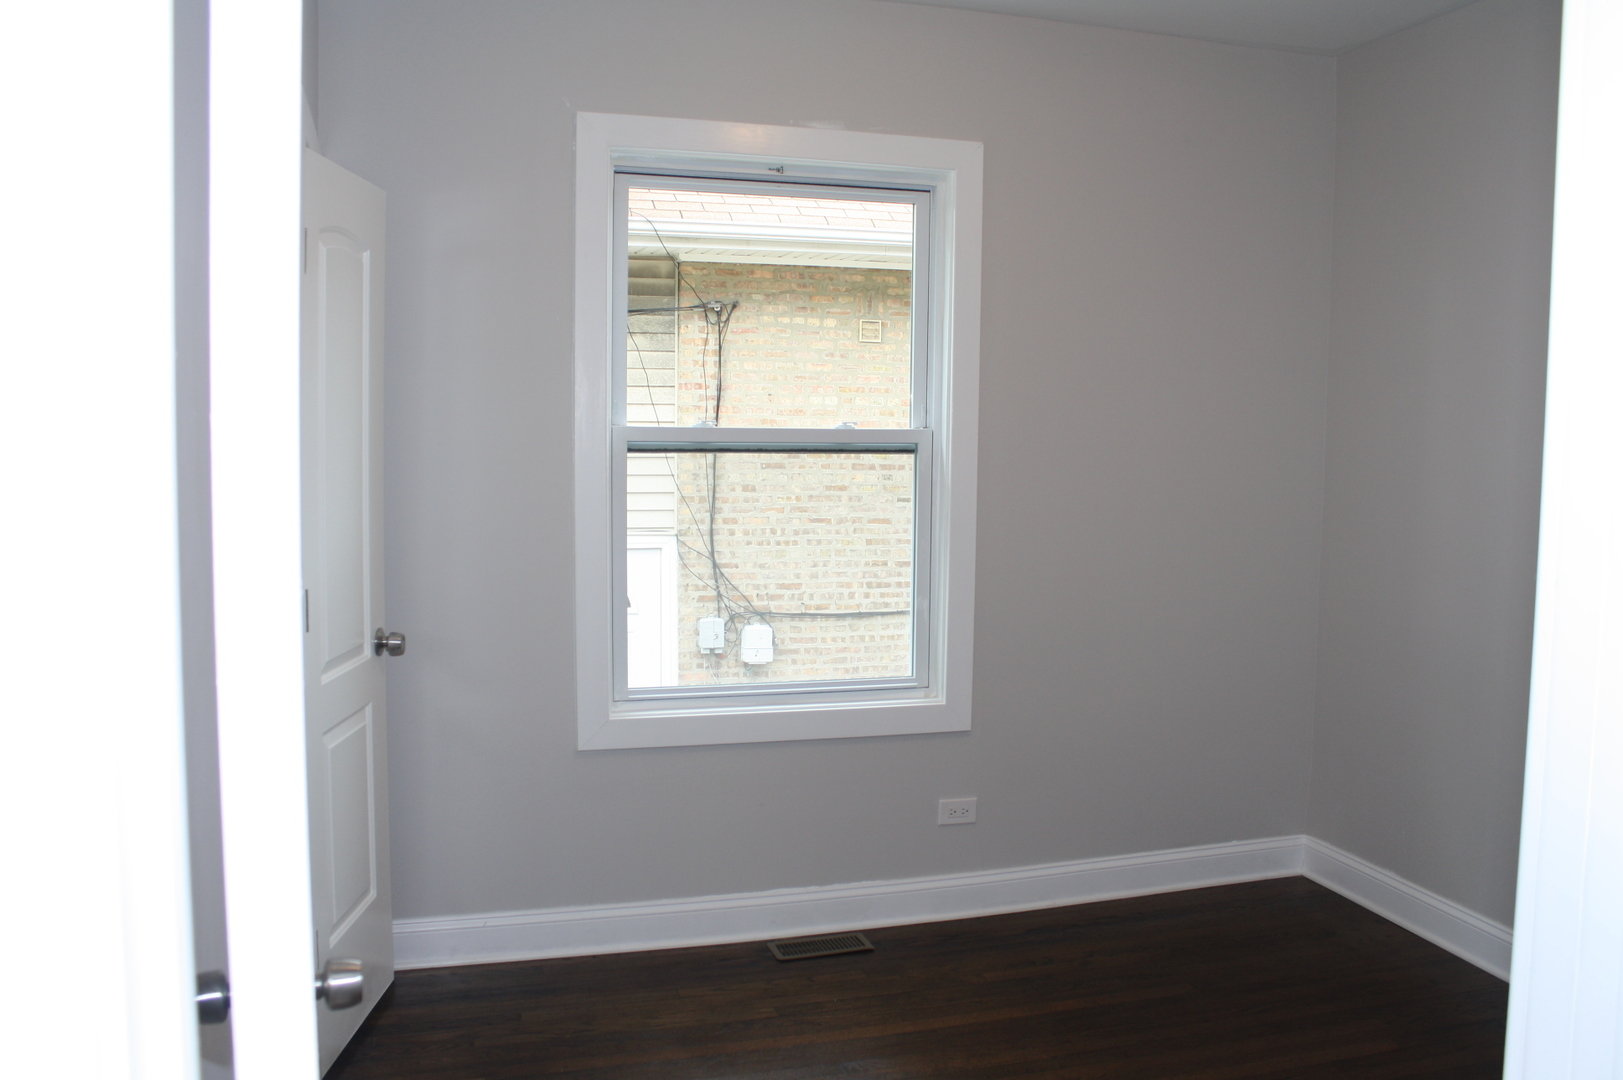 1714 South 9th, Maywood, Illinois, 60153